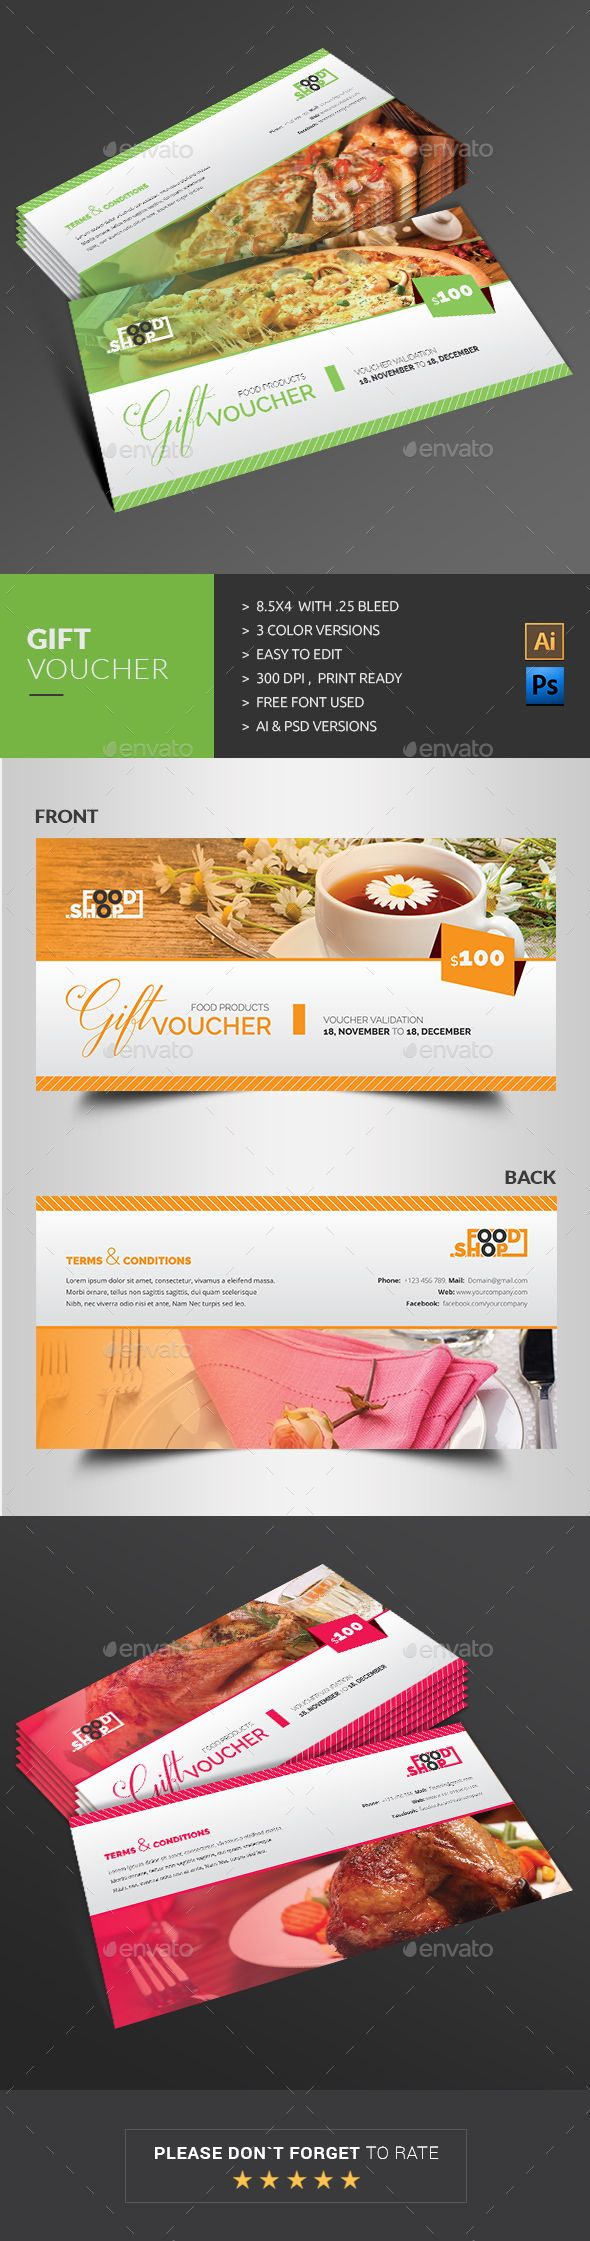 Gift Voucher Template PSD, AI #design Download: http://graphicriver.net/item/gift-voucher/13784633?ref=ksioks